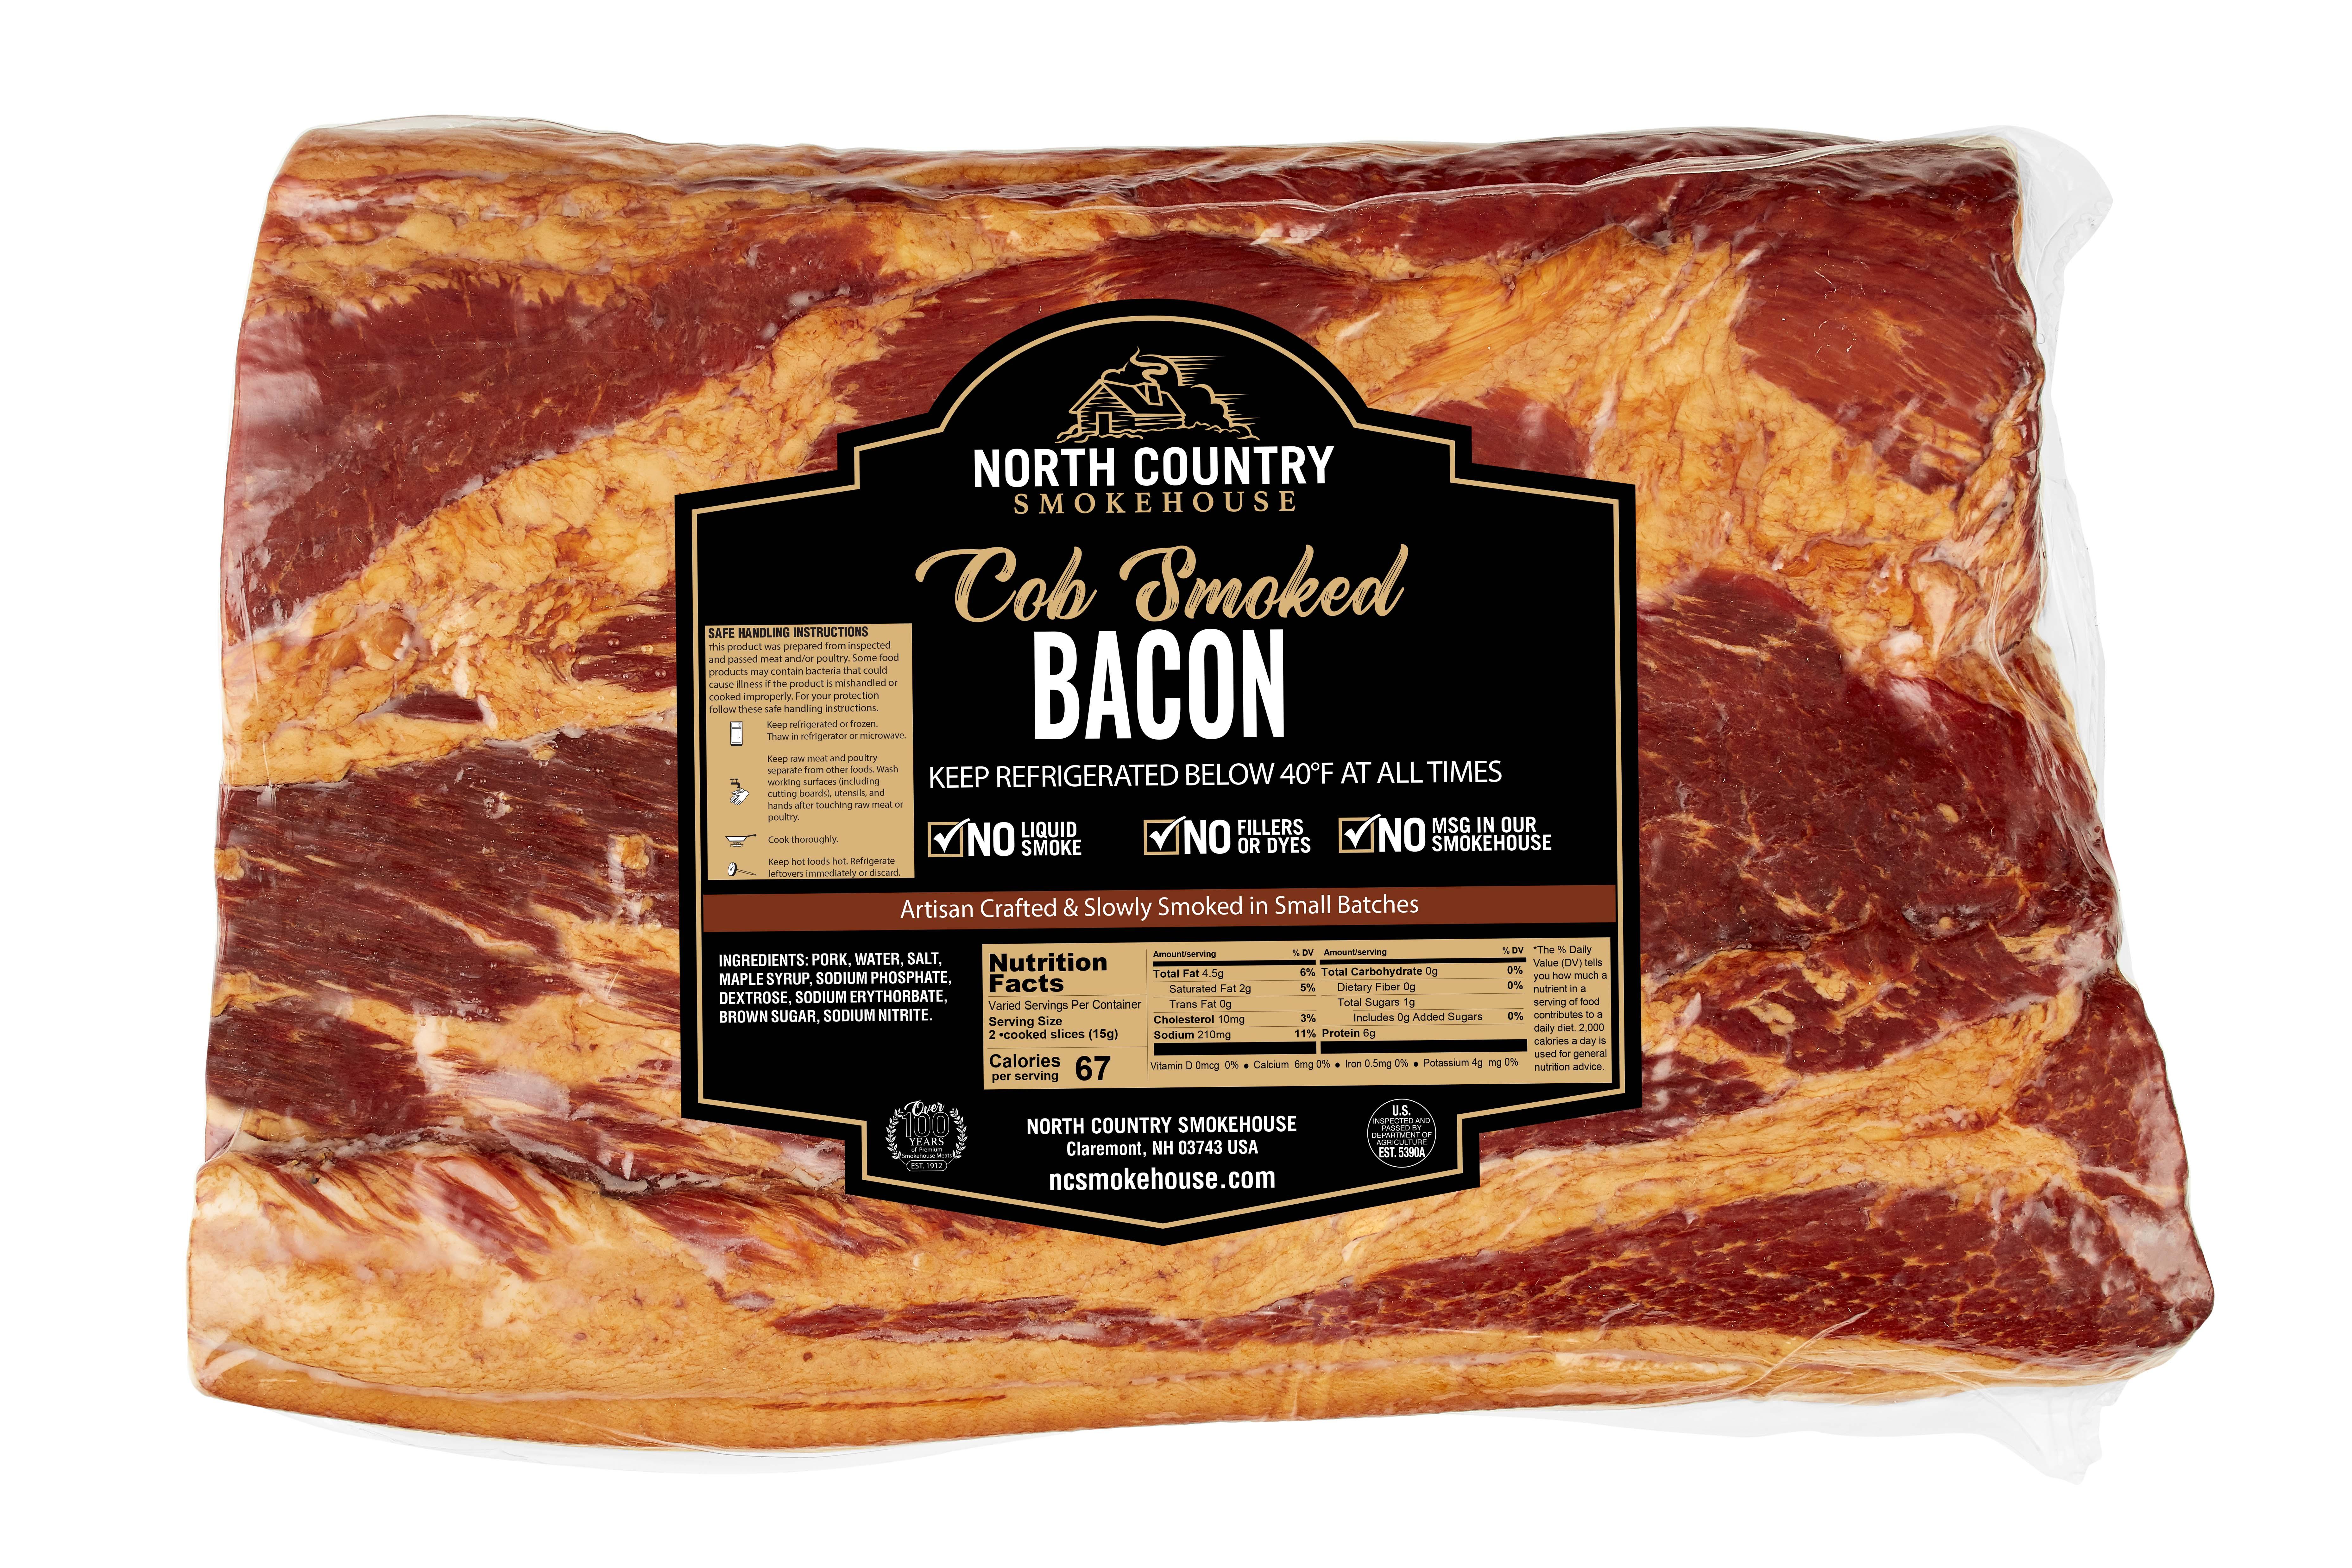 Original Cob Smoked Slab Bacon - 1, 5-7 lb. package